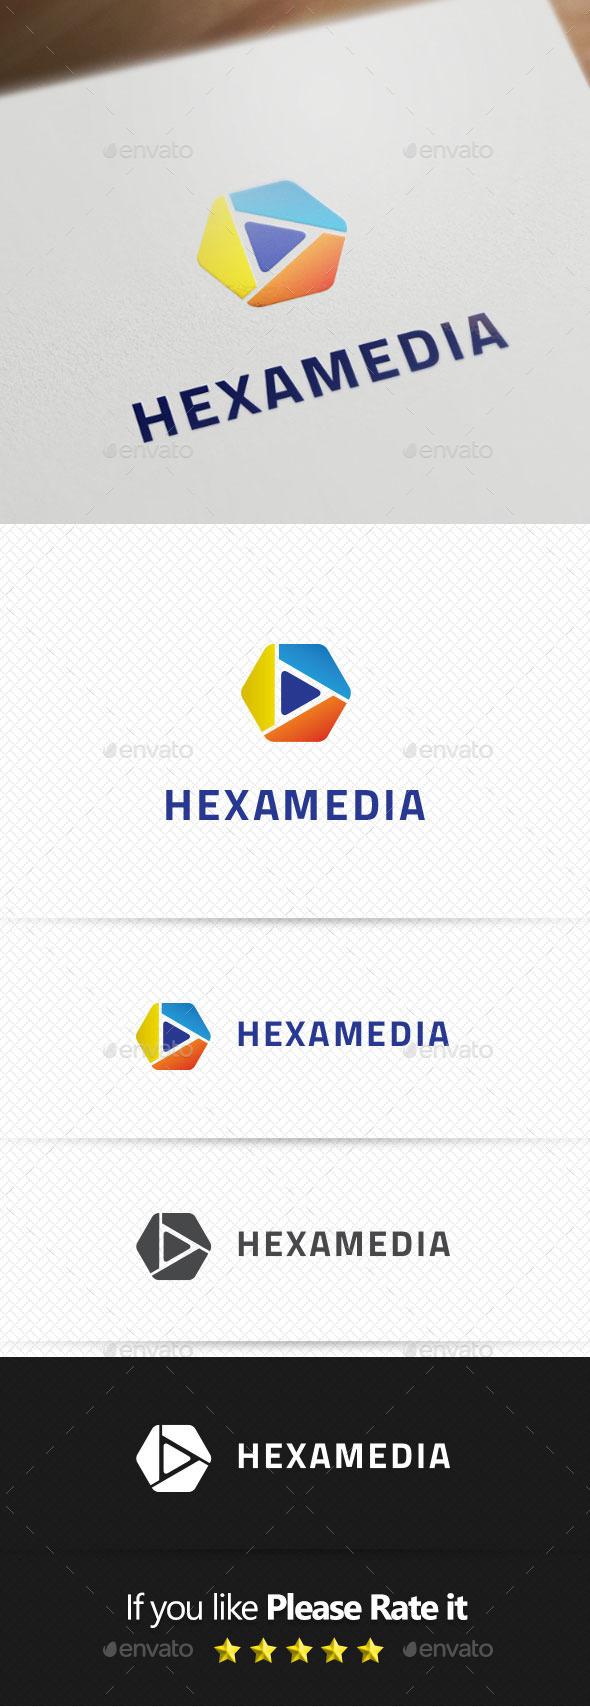 Hexamedia Logo Templates